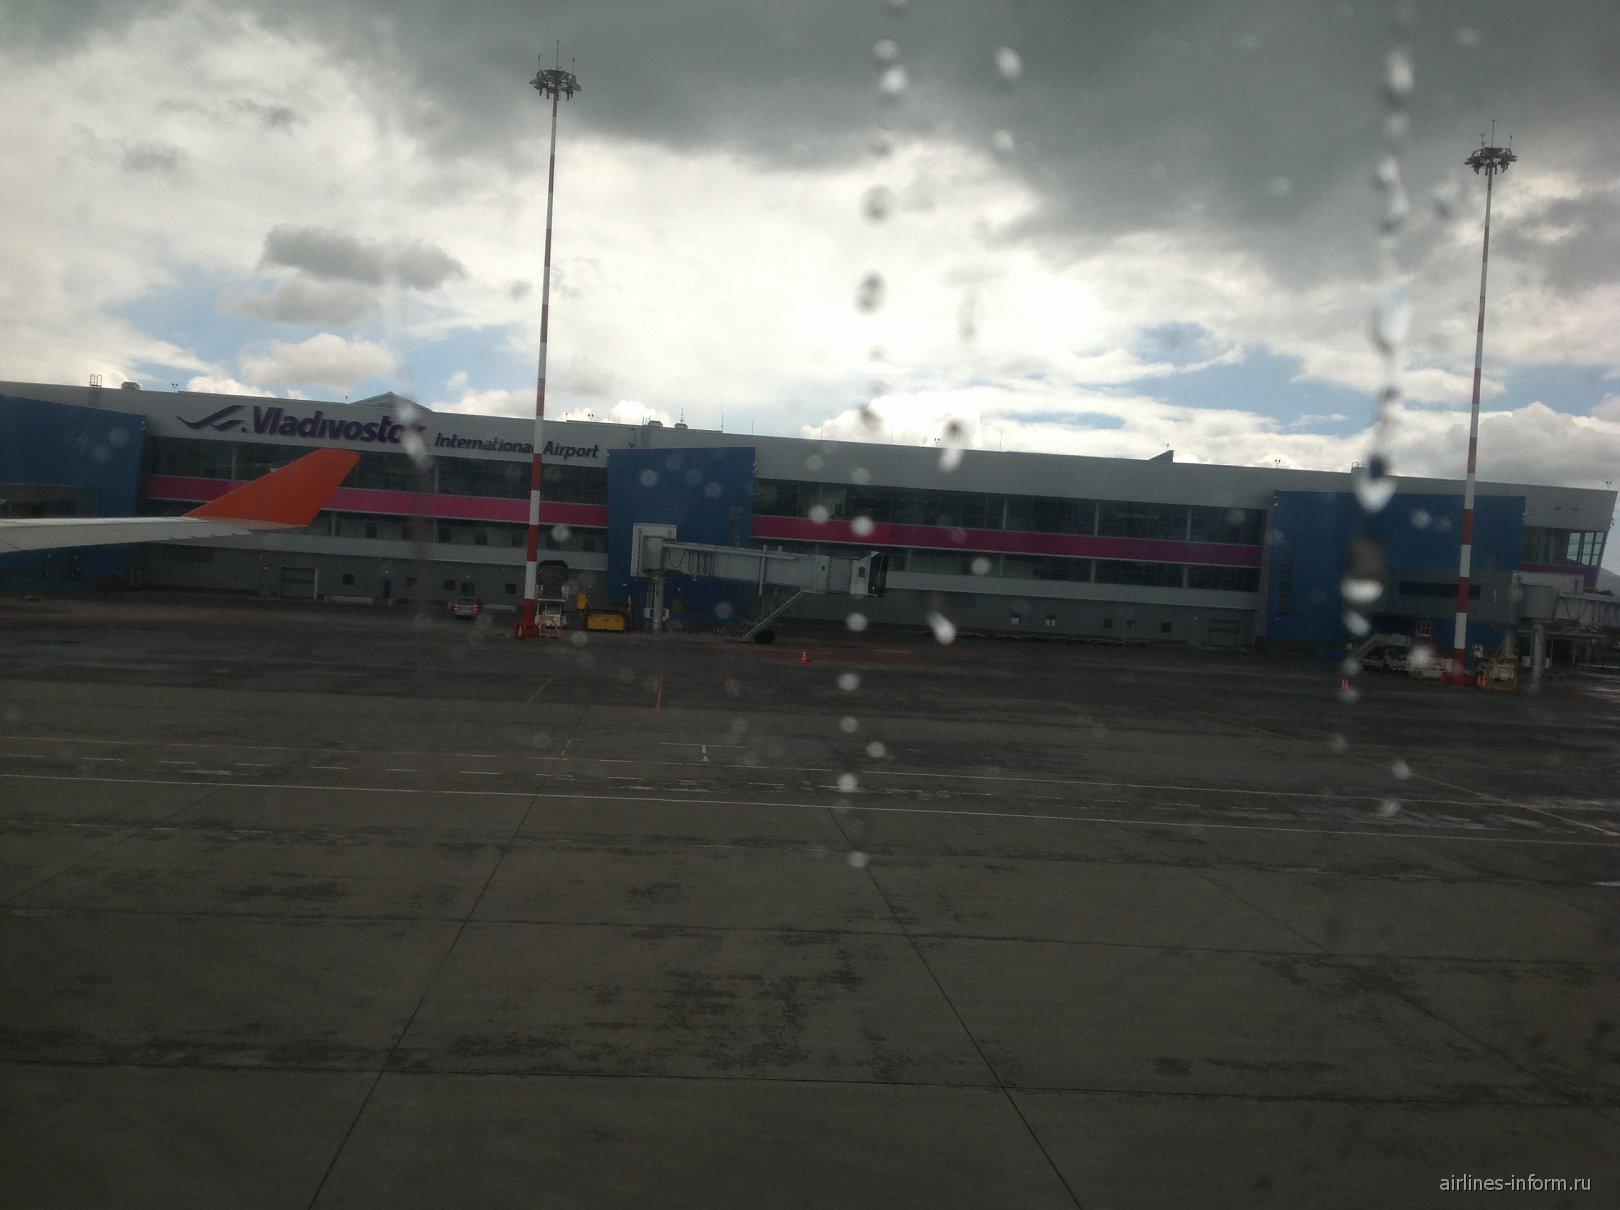 Рейс Аэрофлота Владивосток-Москва